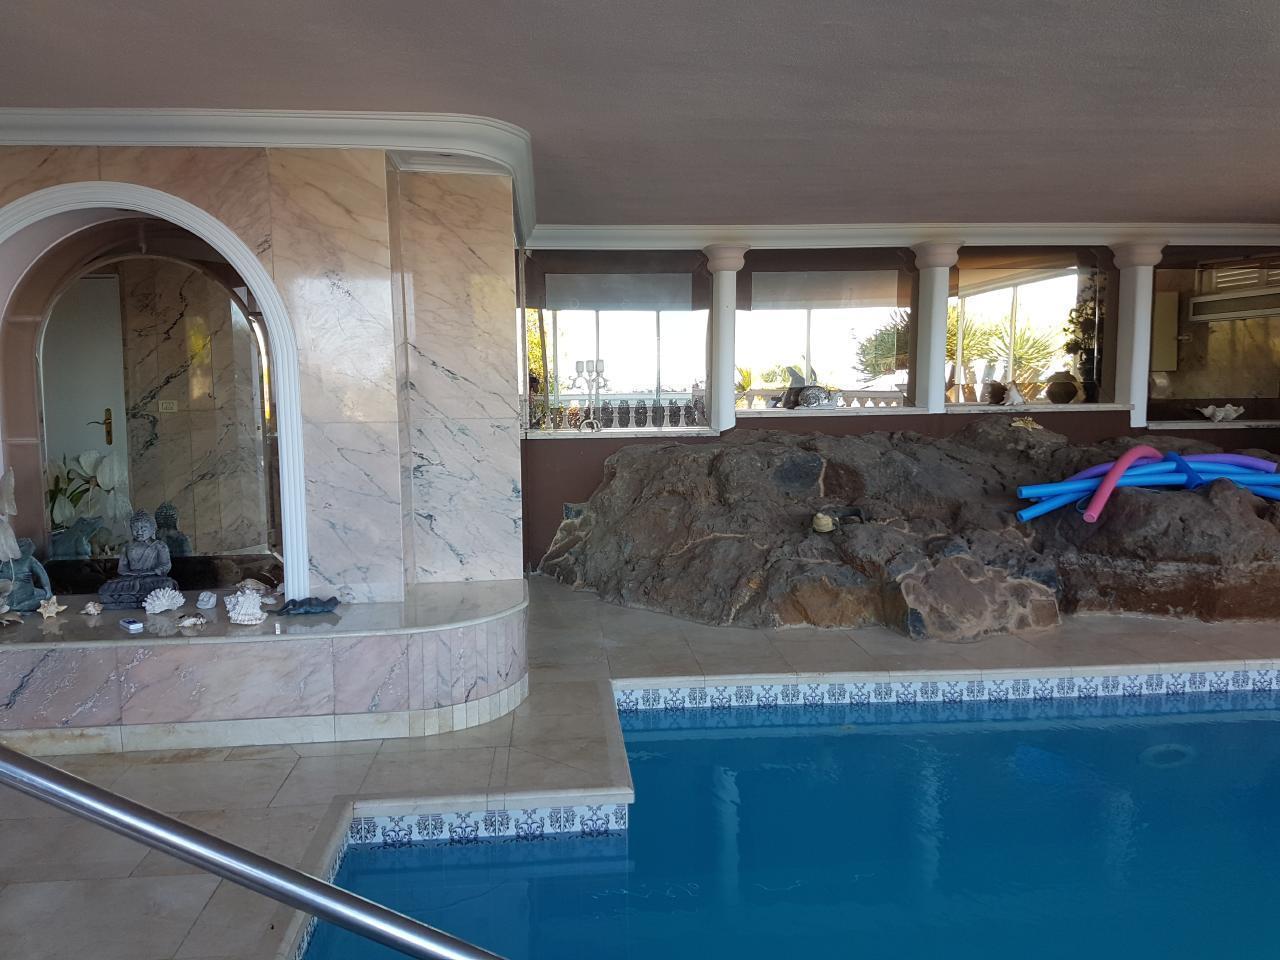 Appartement de vacances Villa Larnia Familien Apartment   * Urlaub für Körper, Geist und Seele * (2529406), El Sauzal, Ténérife, Iles Canaries, Espagne, image 37